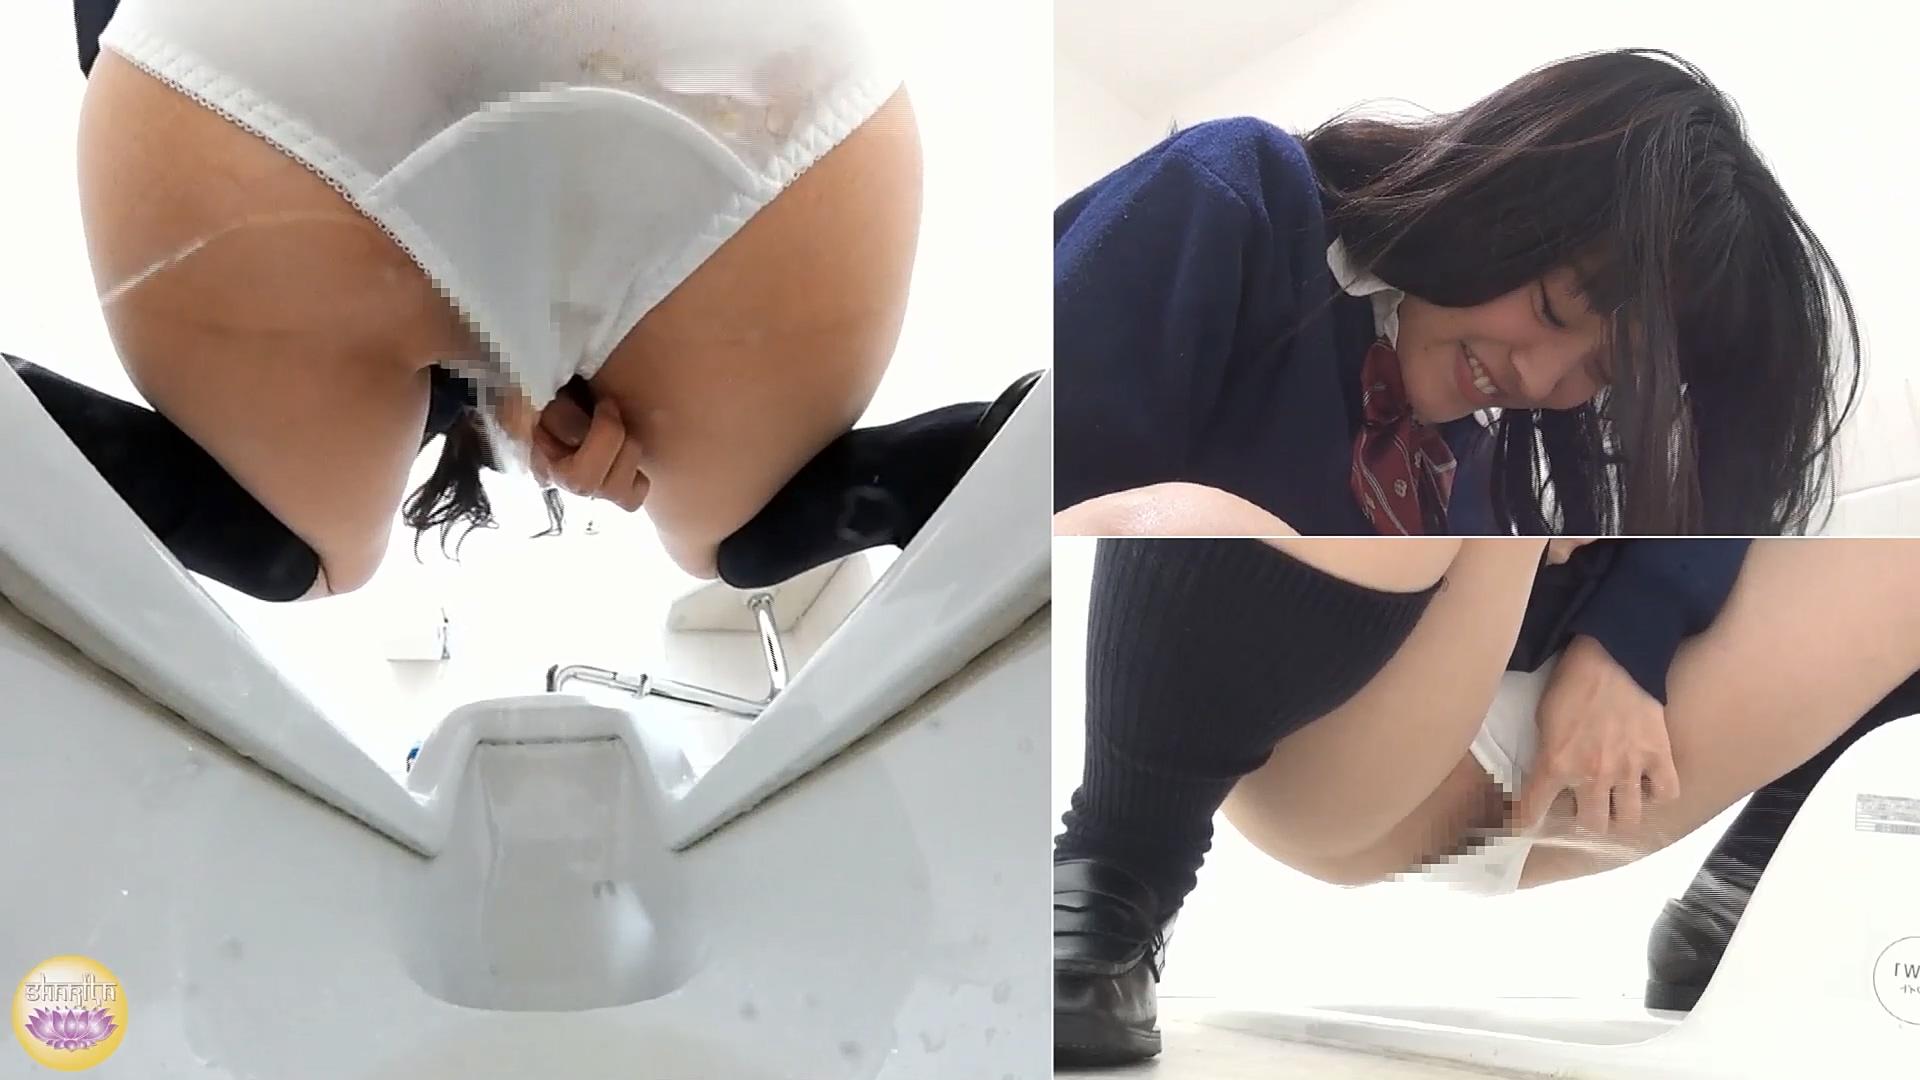 порно японии онлайн подсматривание - 14